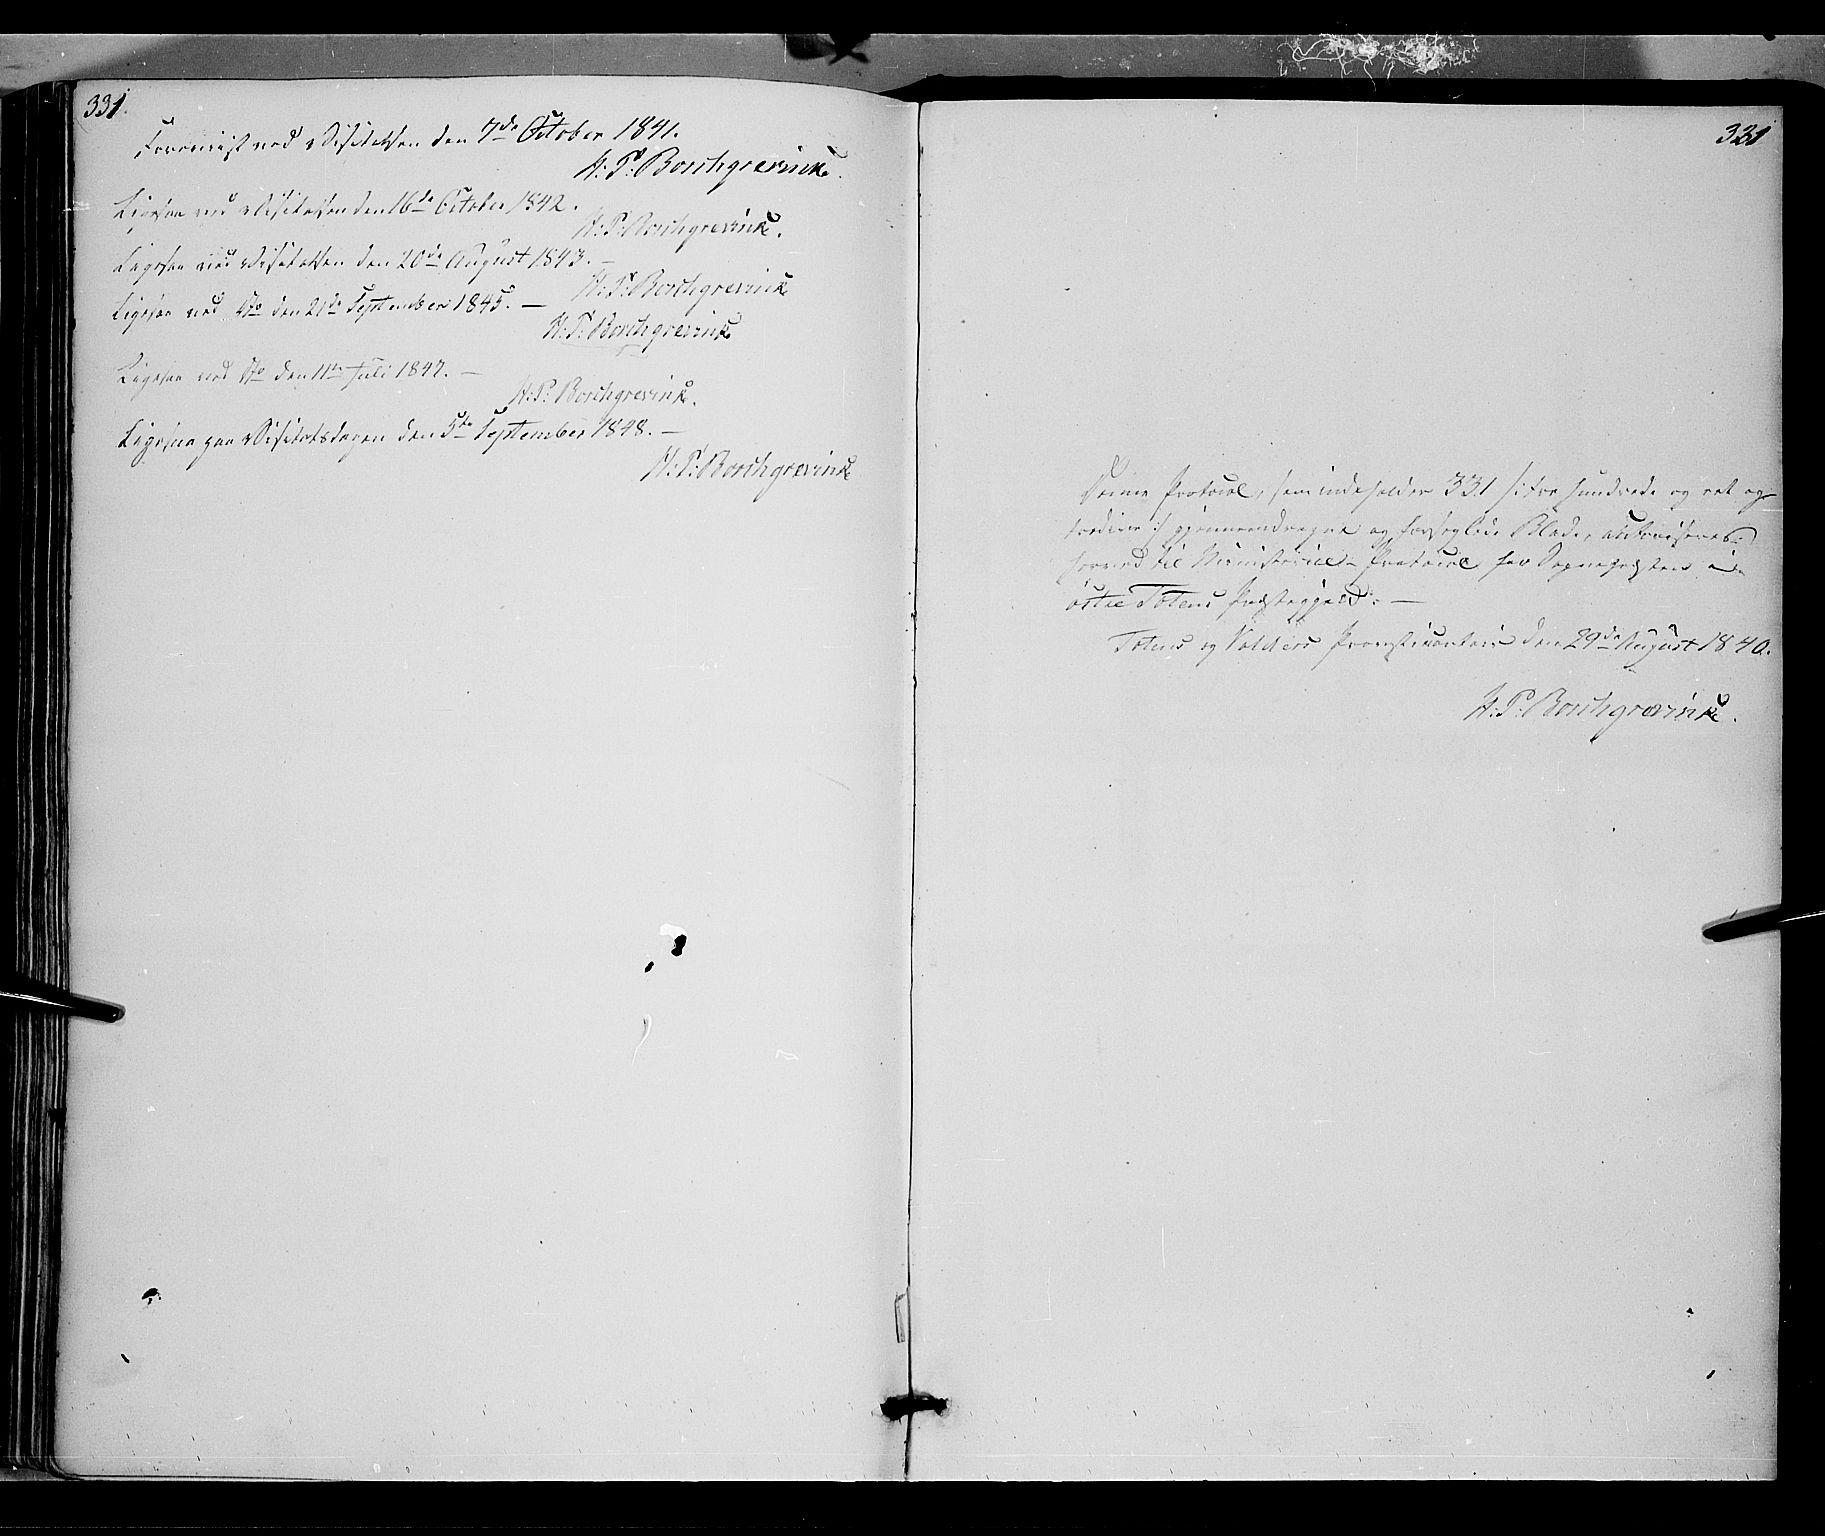 SAH, Østre Toten prestekontor, Ministerialbok nr. 2, 1840-1847, s. 321